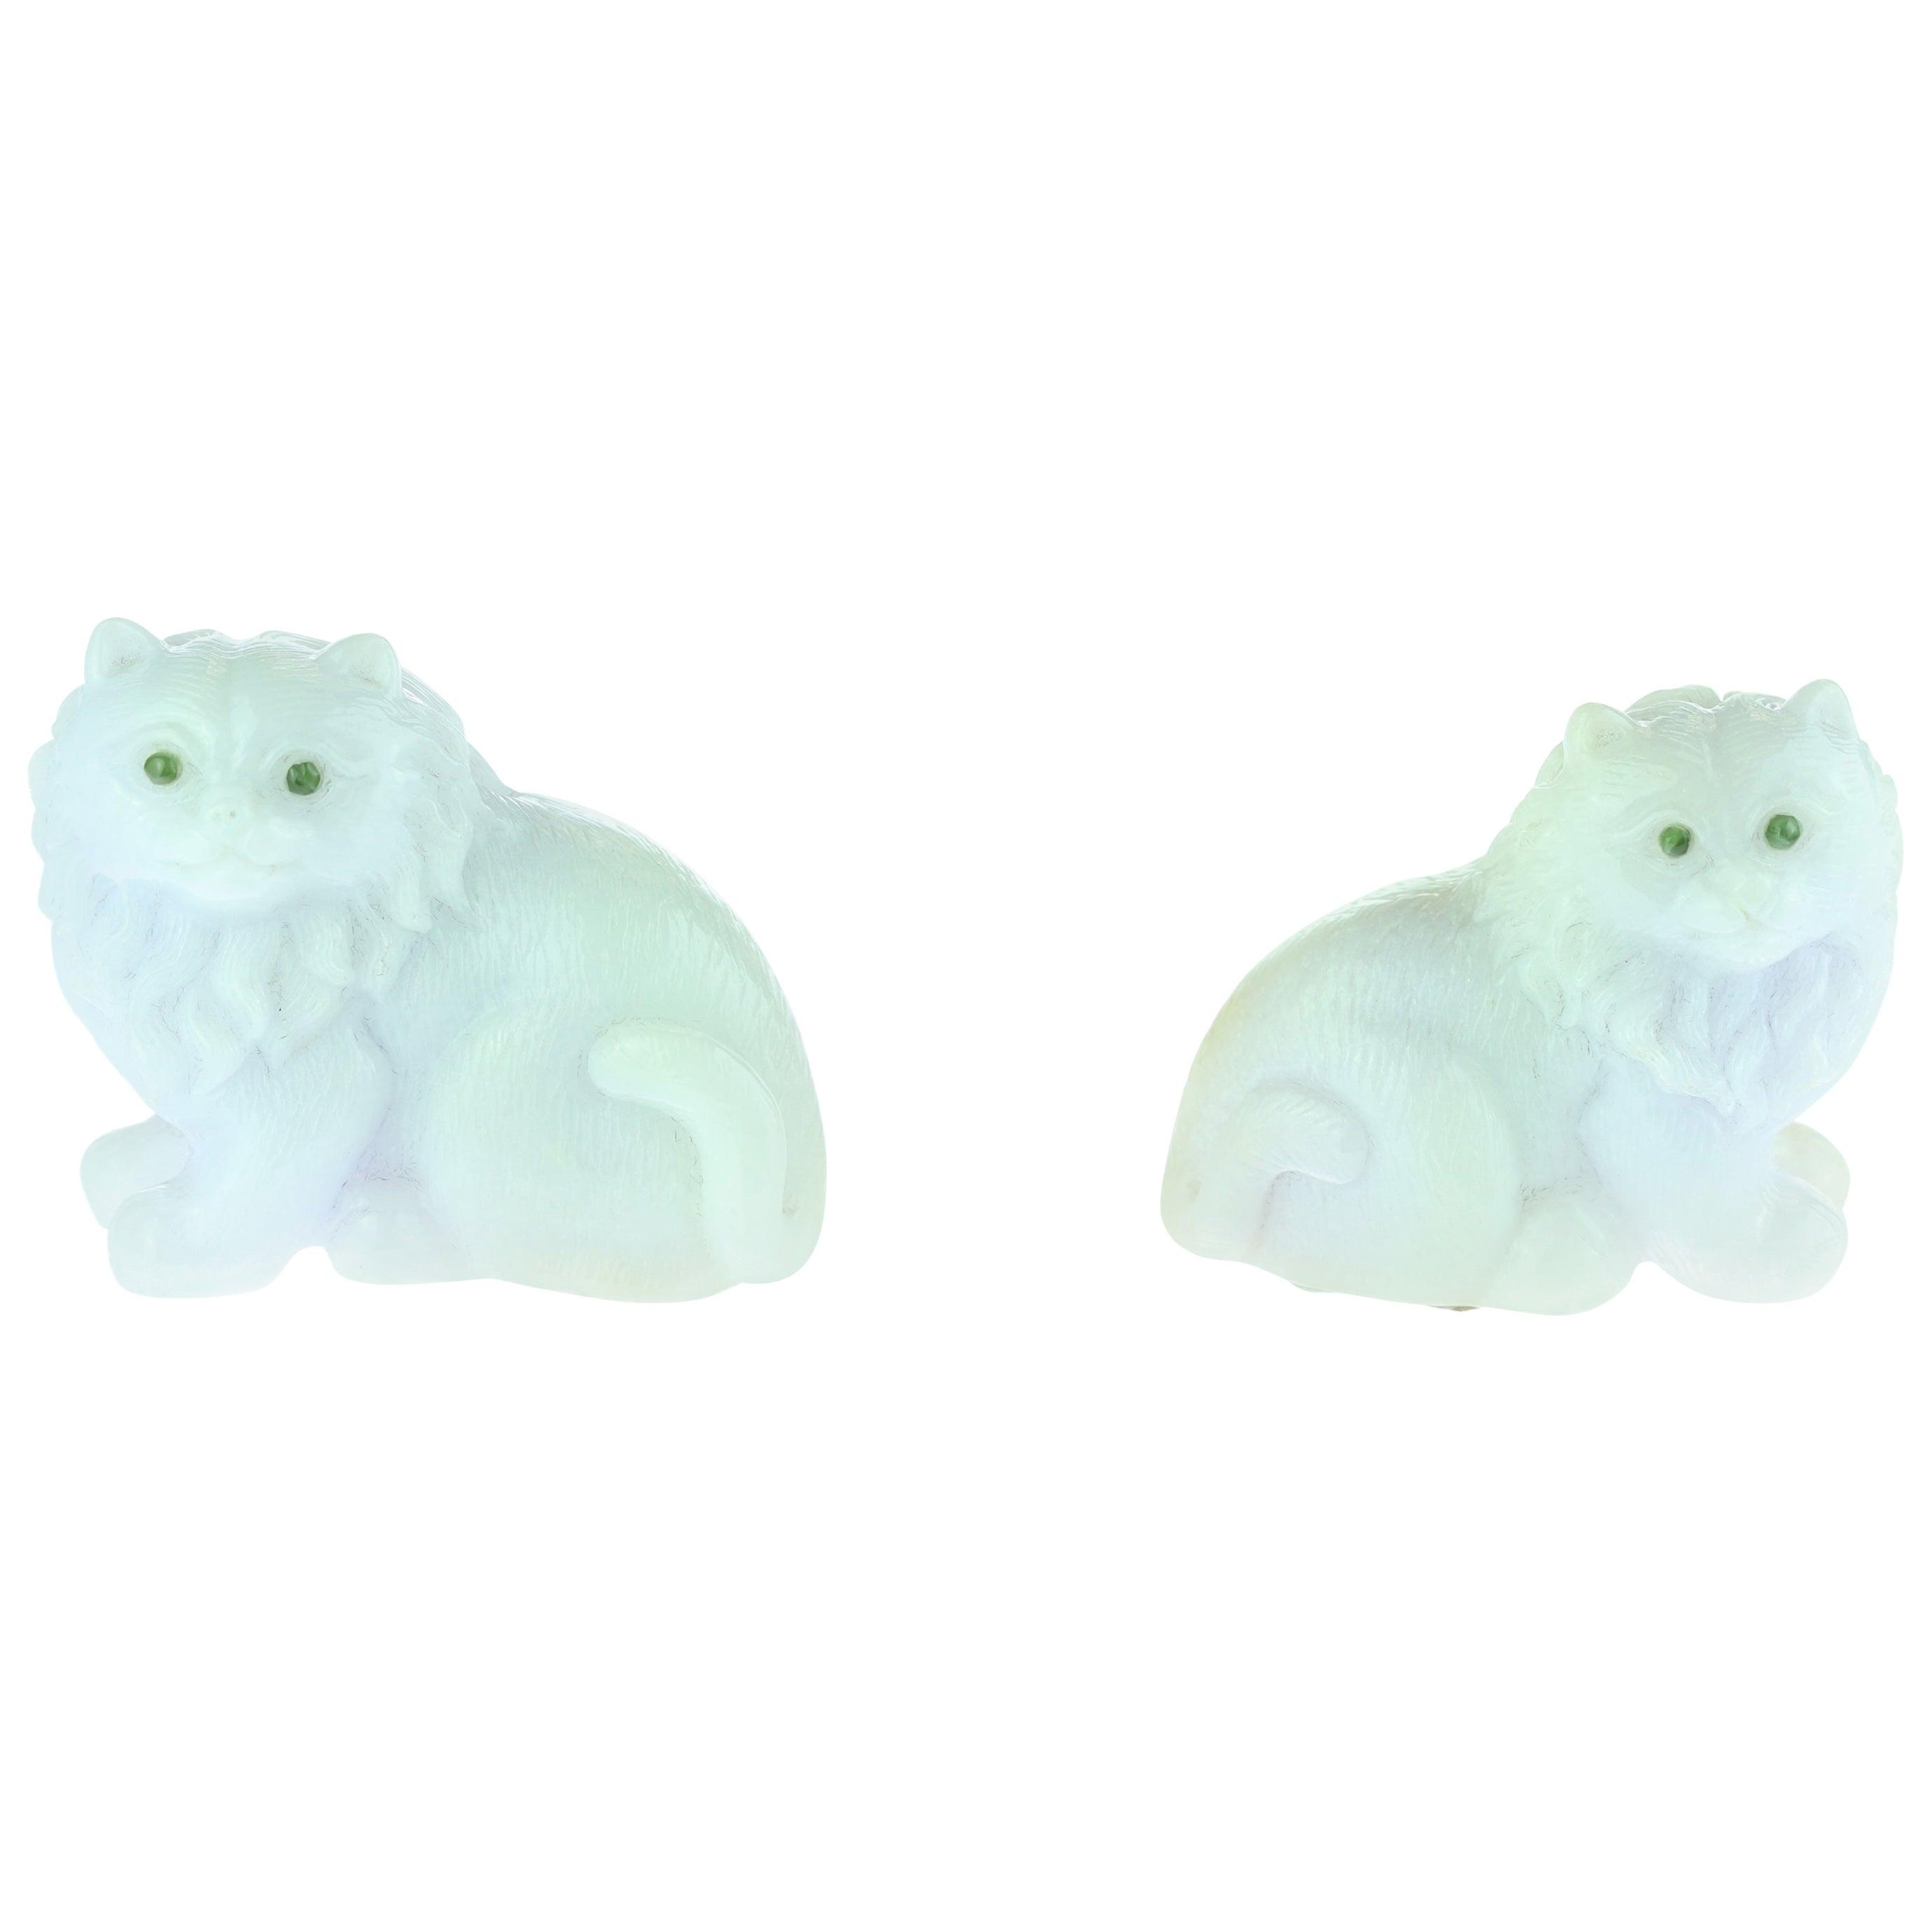 Lavender Jade Cat Feline Animal Asian Art Blue Green Home Deco Sculpture